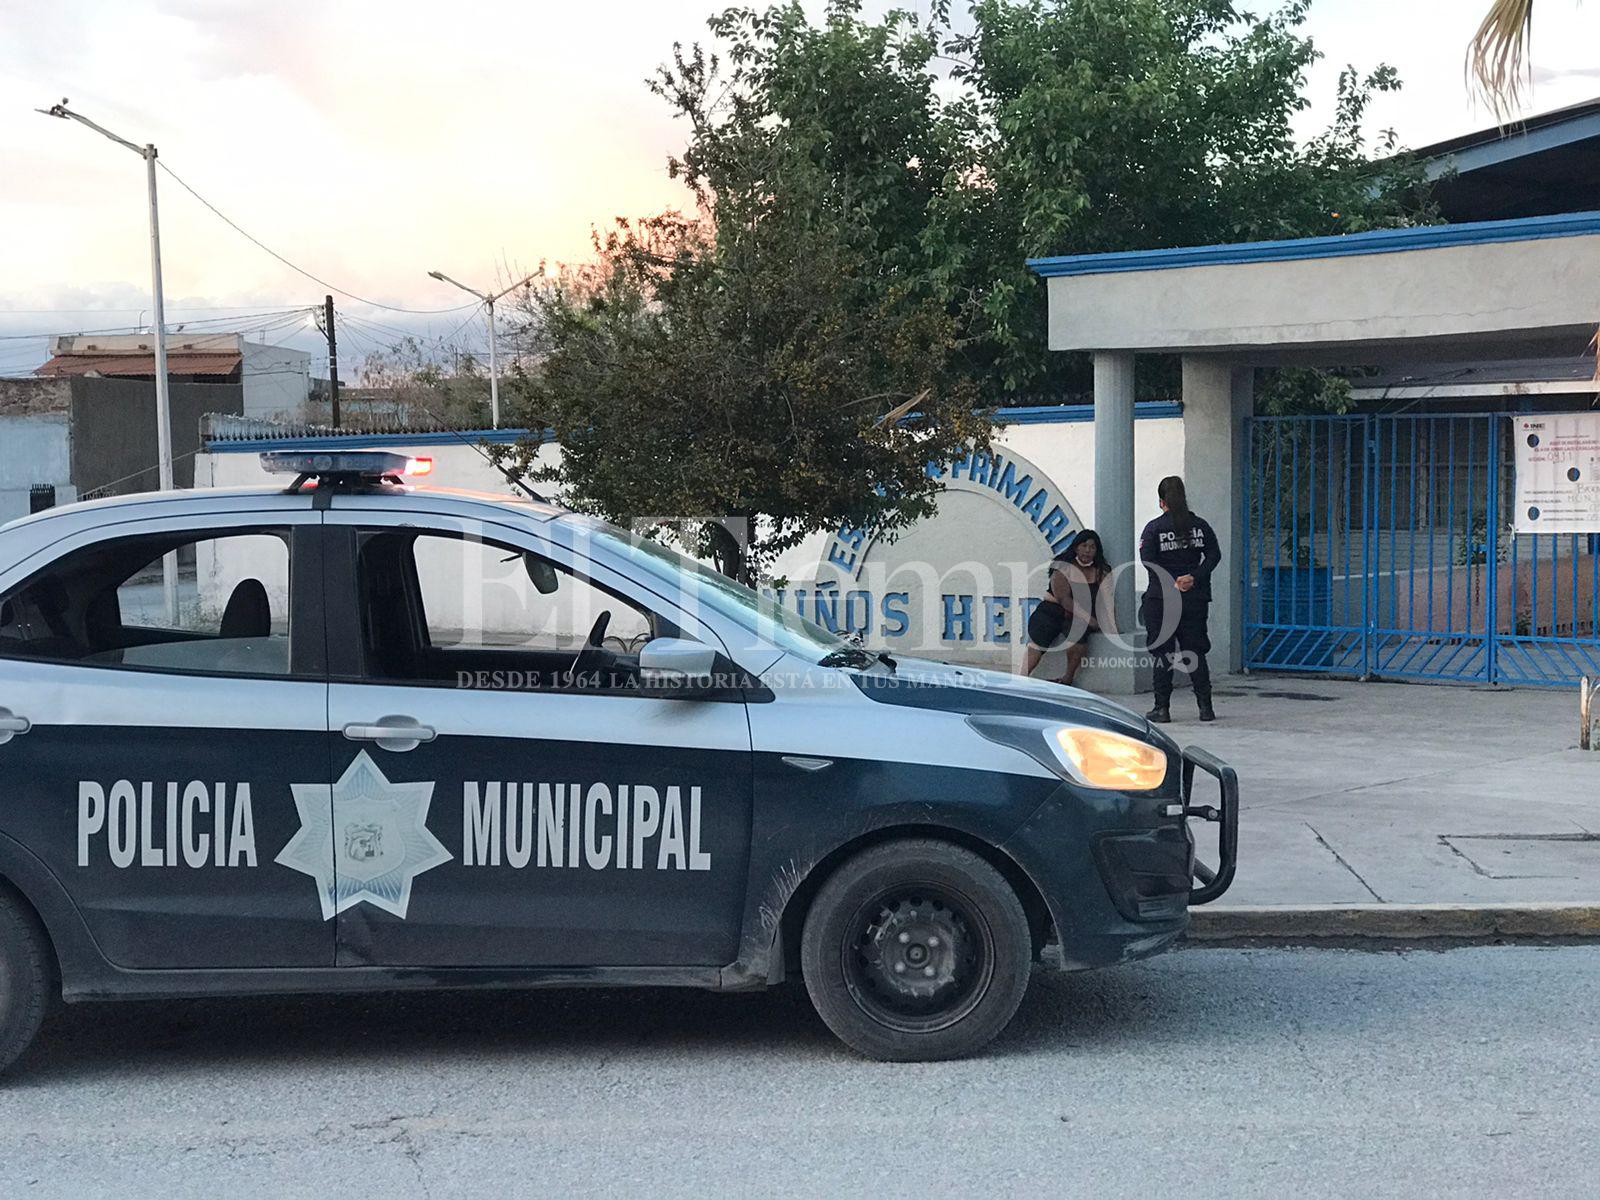 Los policías de Monclova patrullan en chatarras